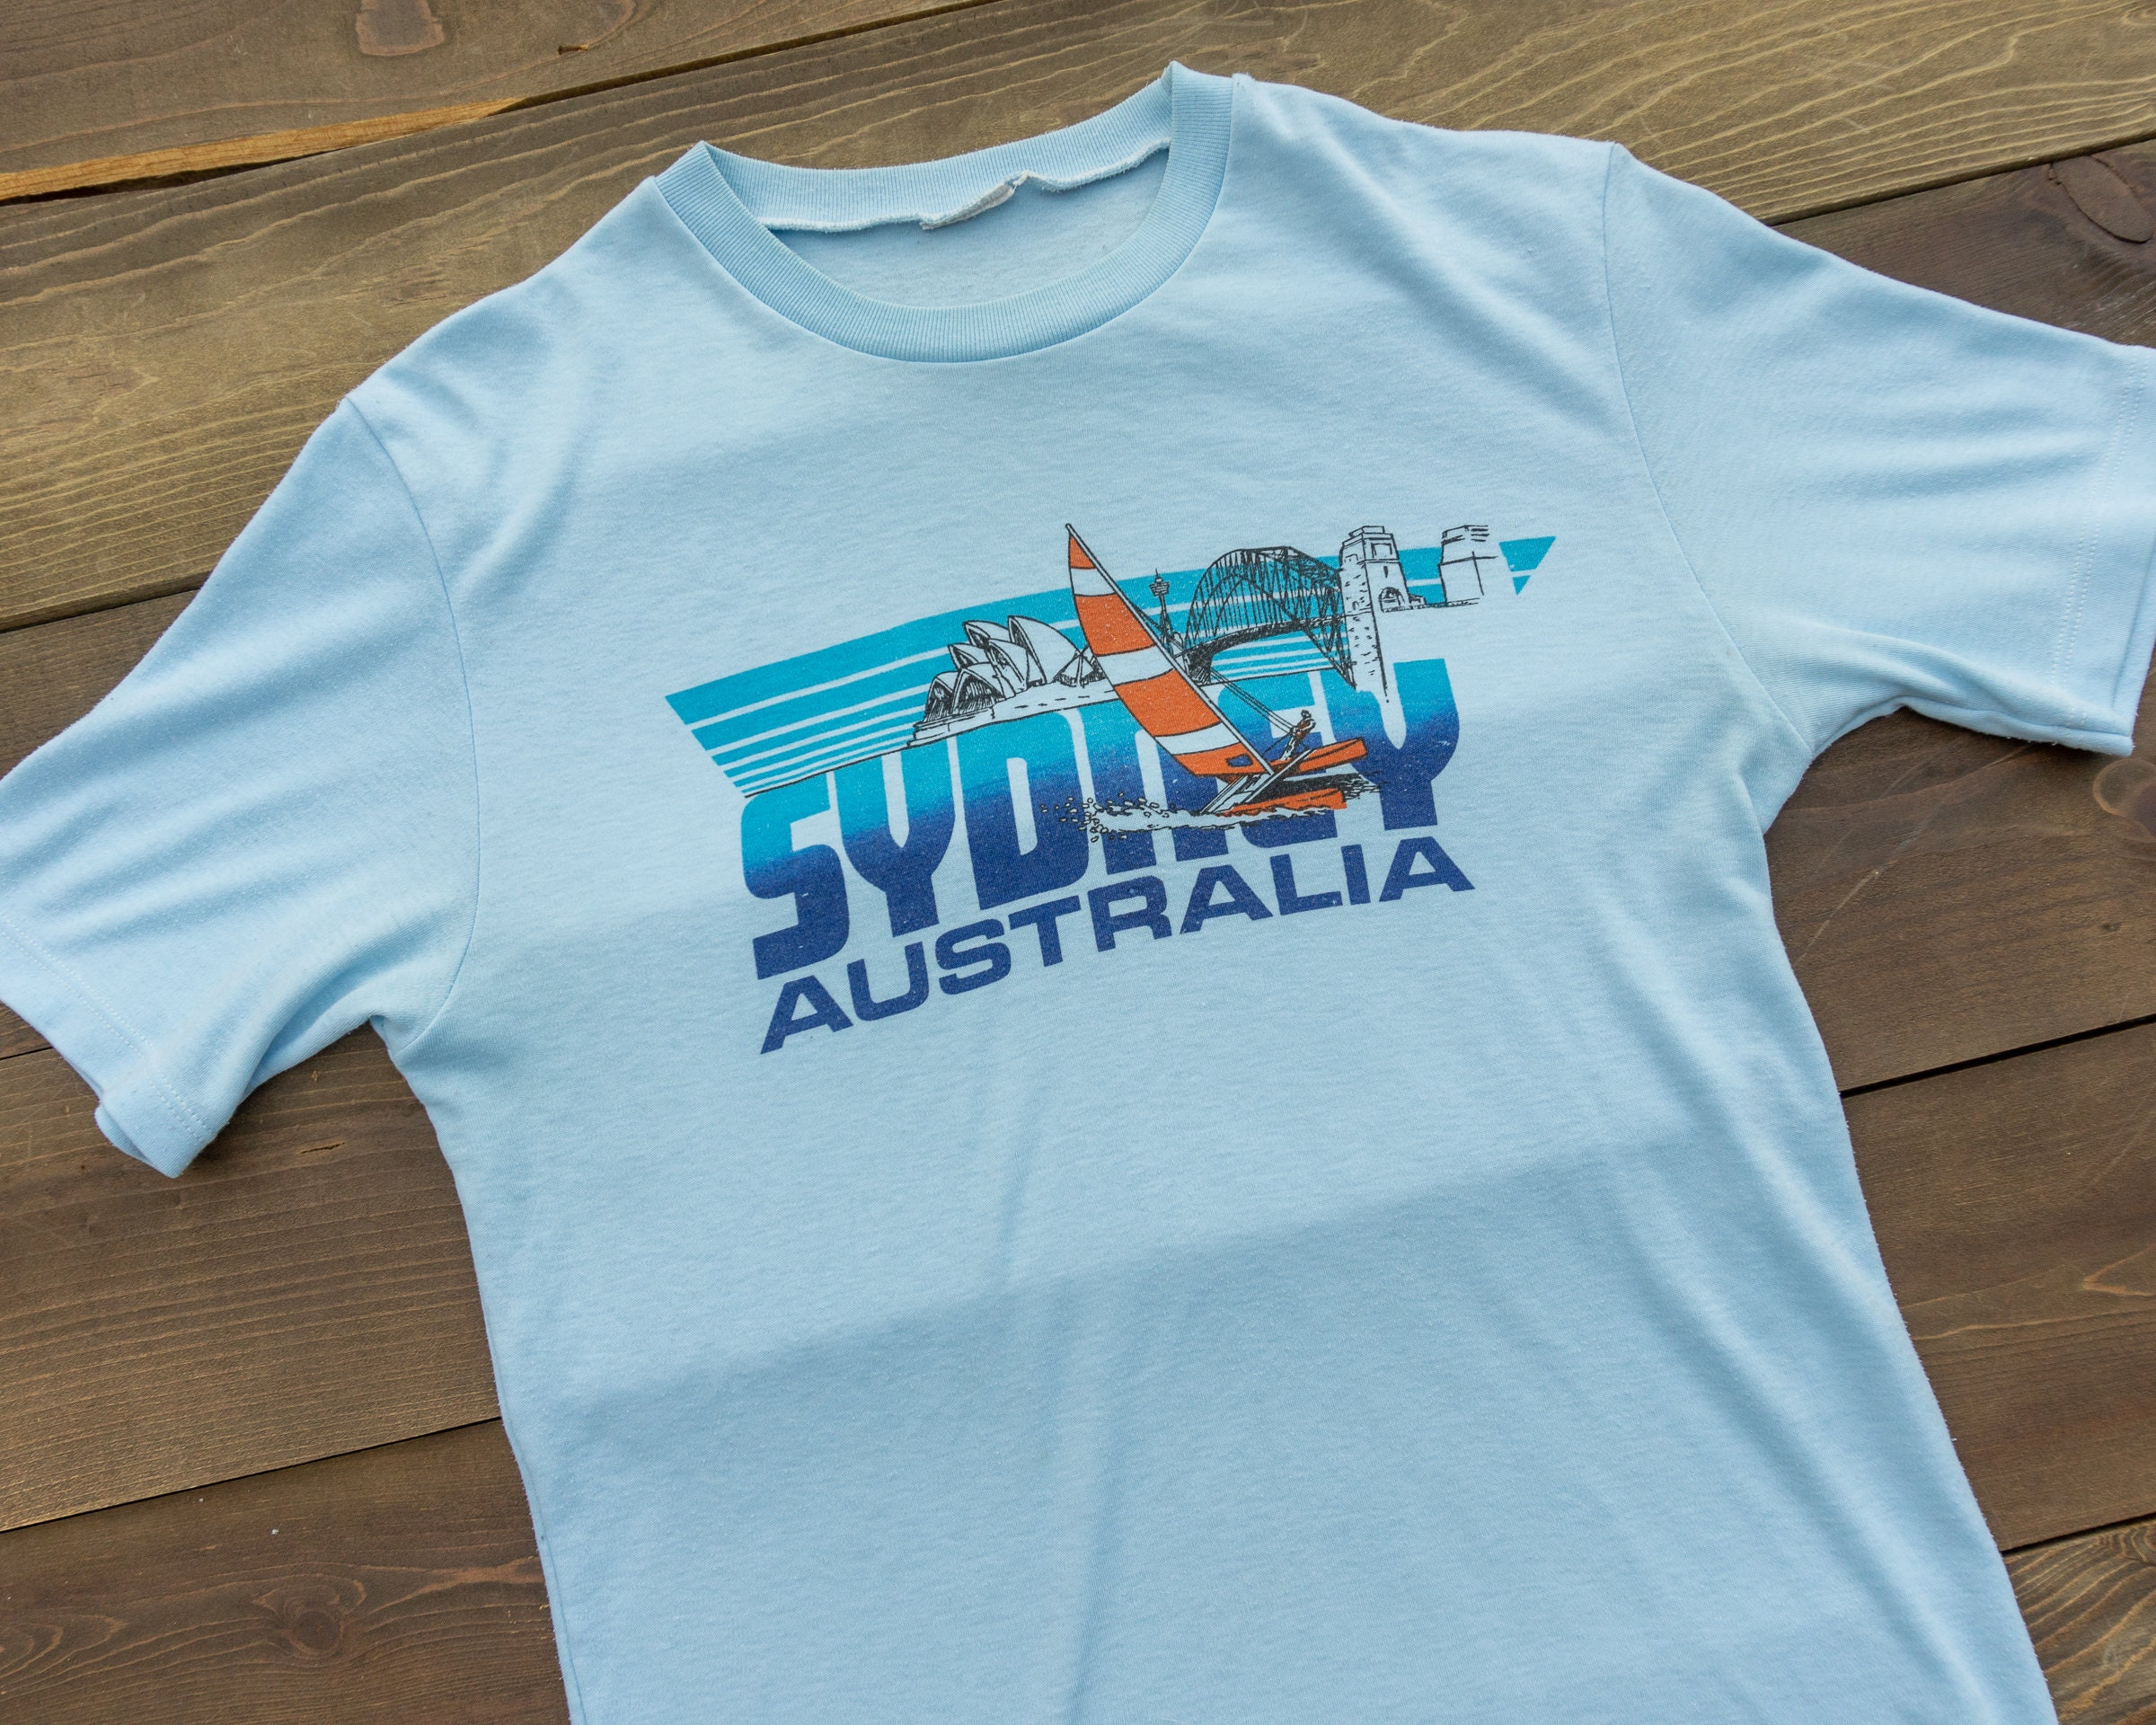 80s Tops, Shirts, T-shirts, Blouse   90s T-shirts 80S Australia Souvenir Tourist T-Shirt Paper Thin $30.00 AT vintagedancer.com